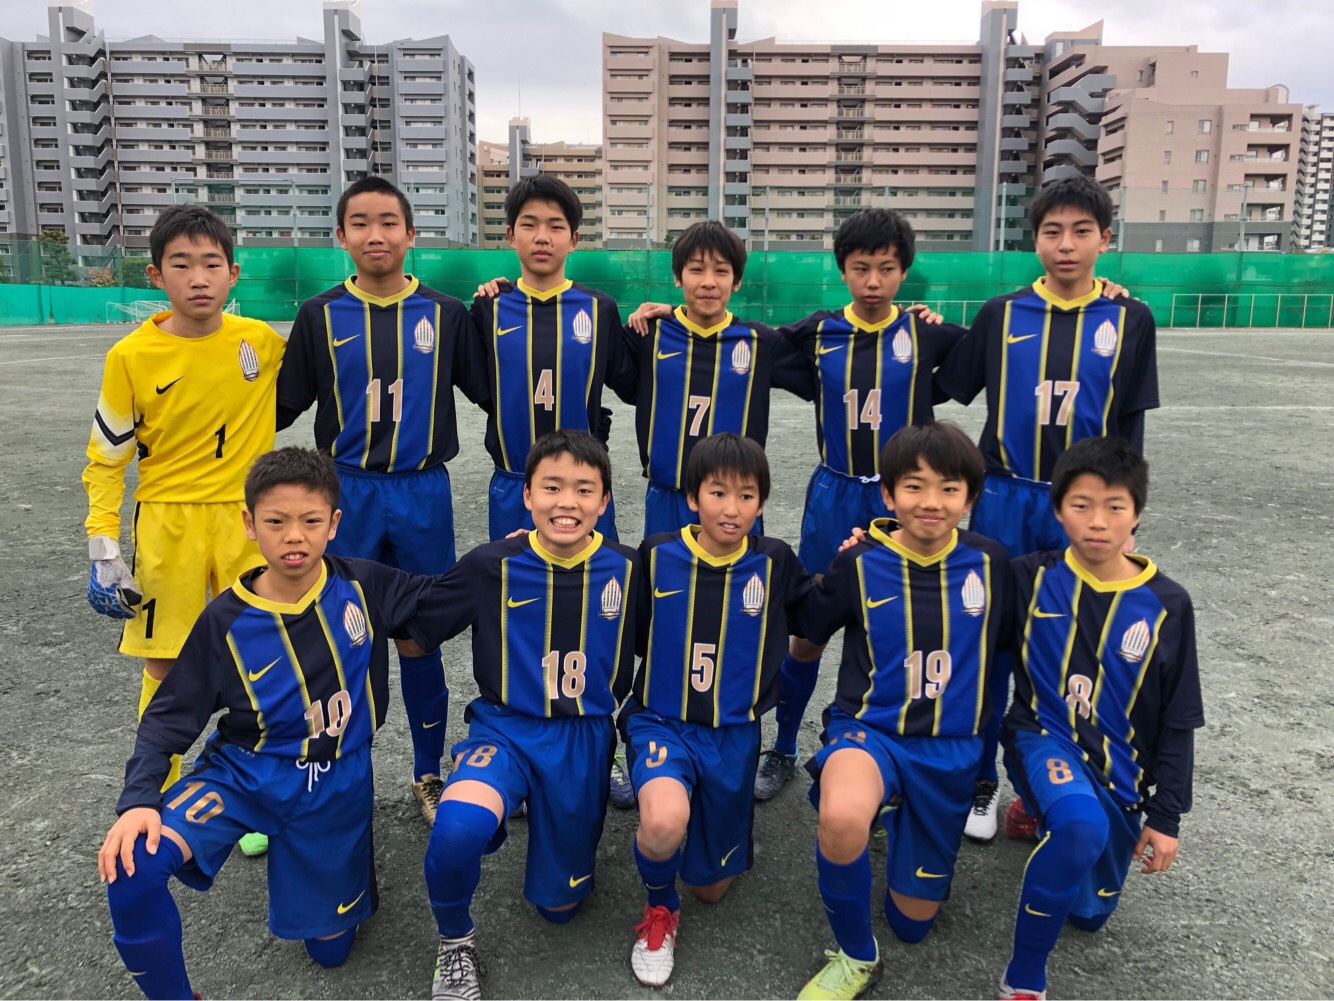 【U13】第22回 千葉県ユース(U-13)サッカー選手権大会  ブロック予選 第2戦